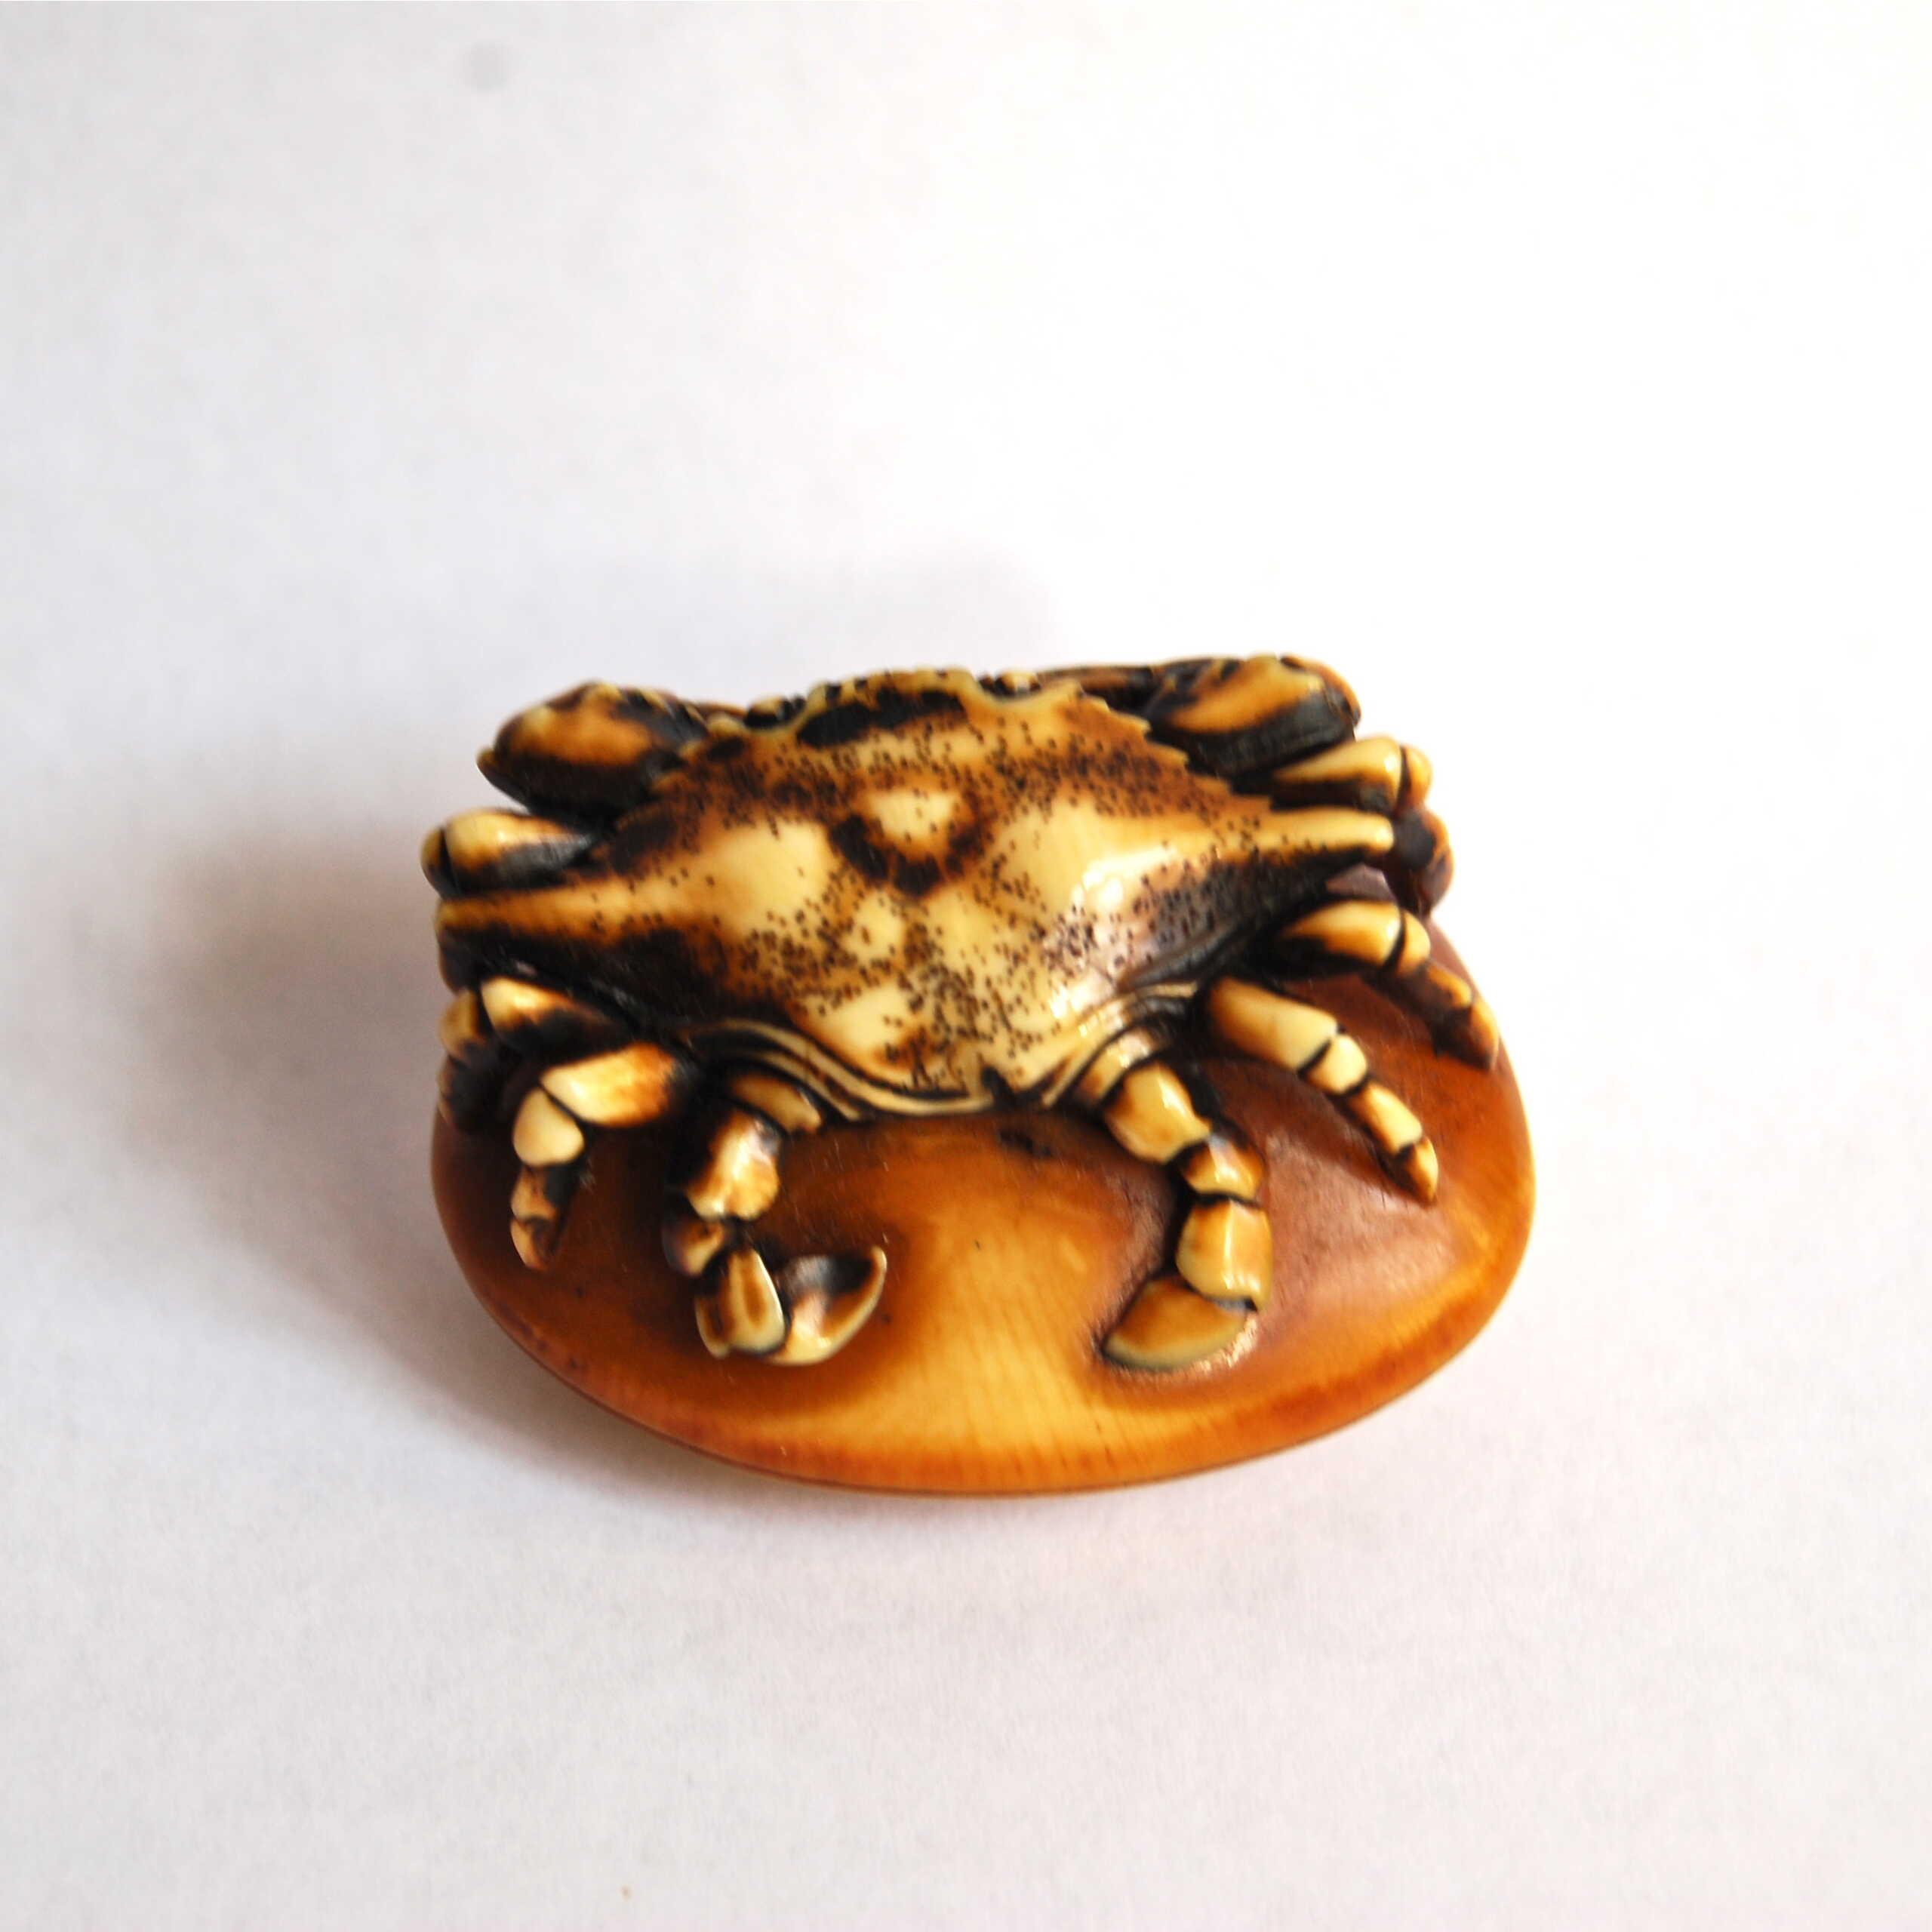 Anraku ivory crab netsuke 3